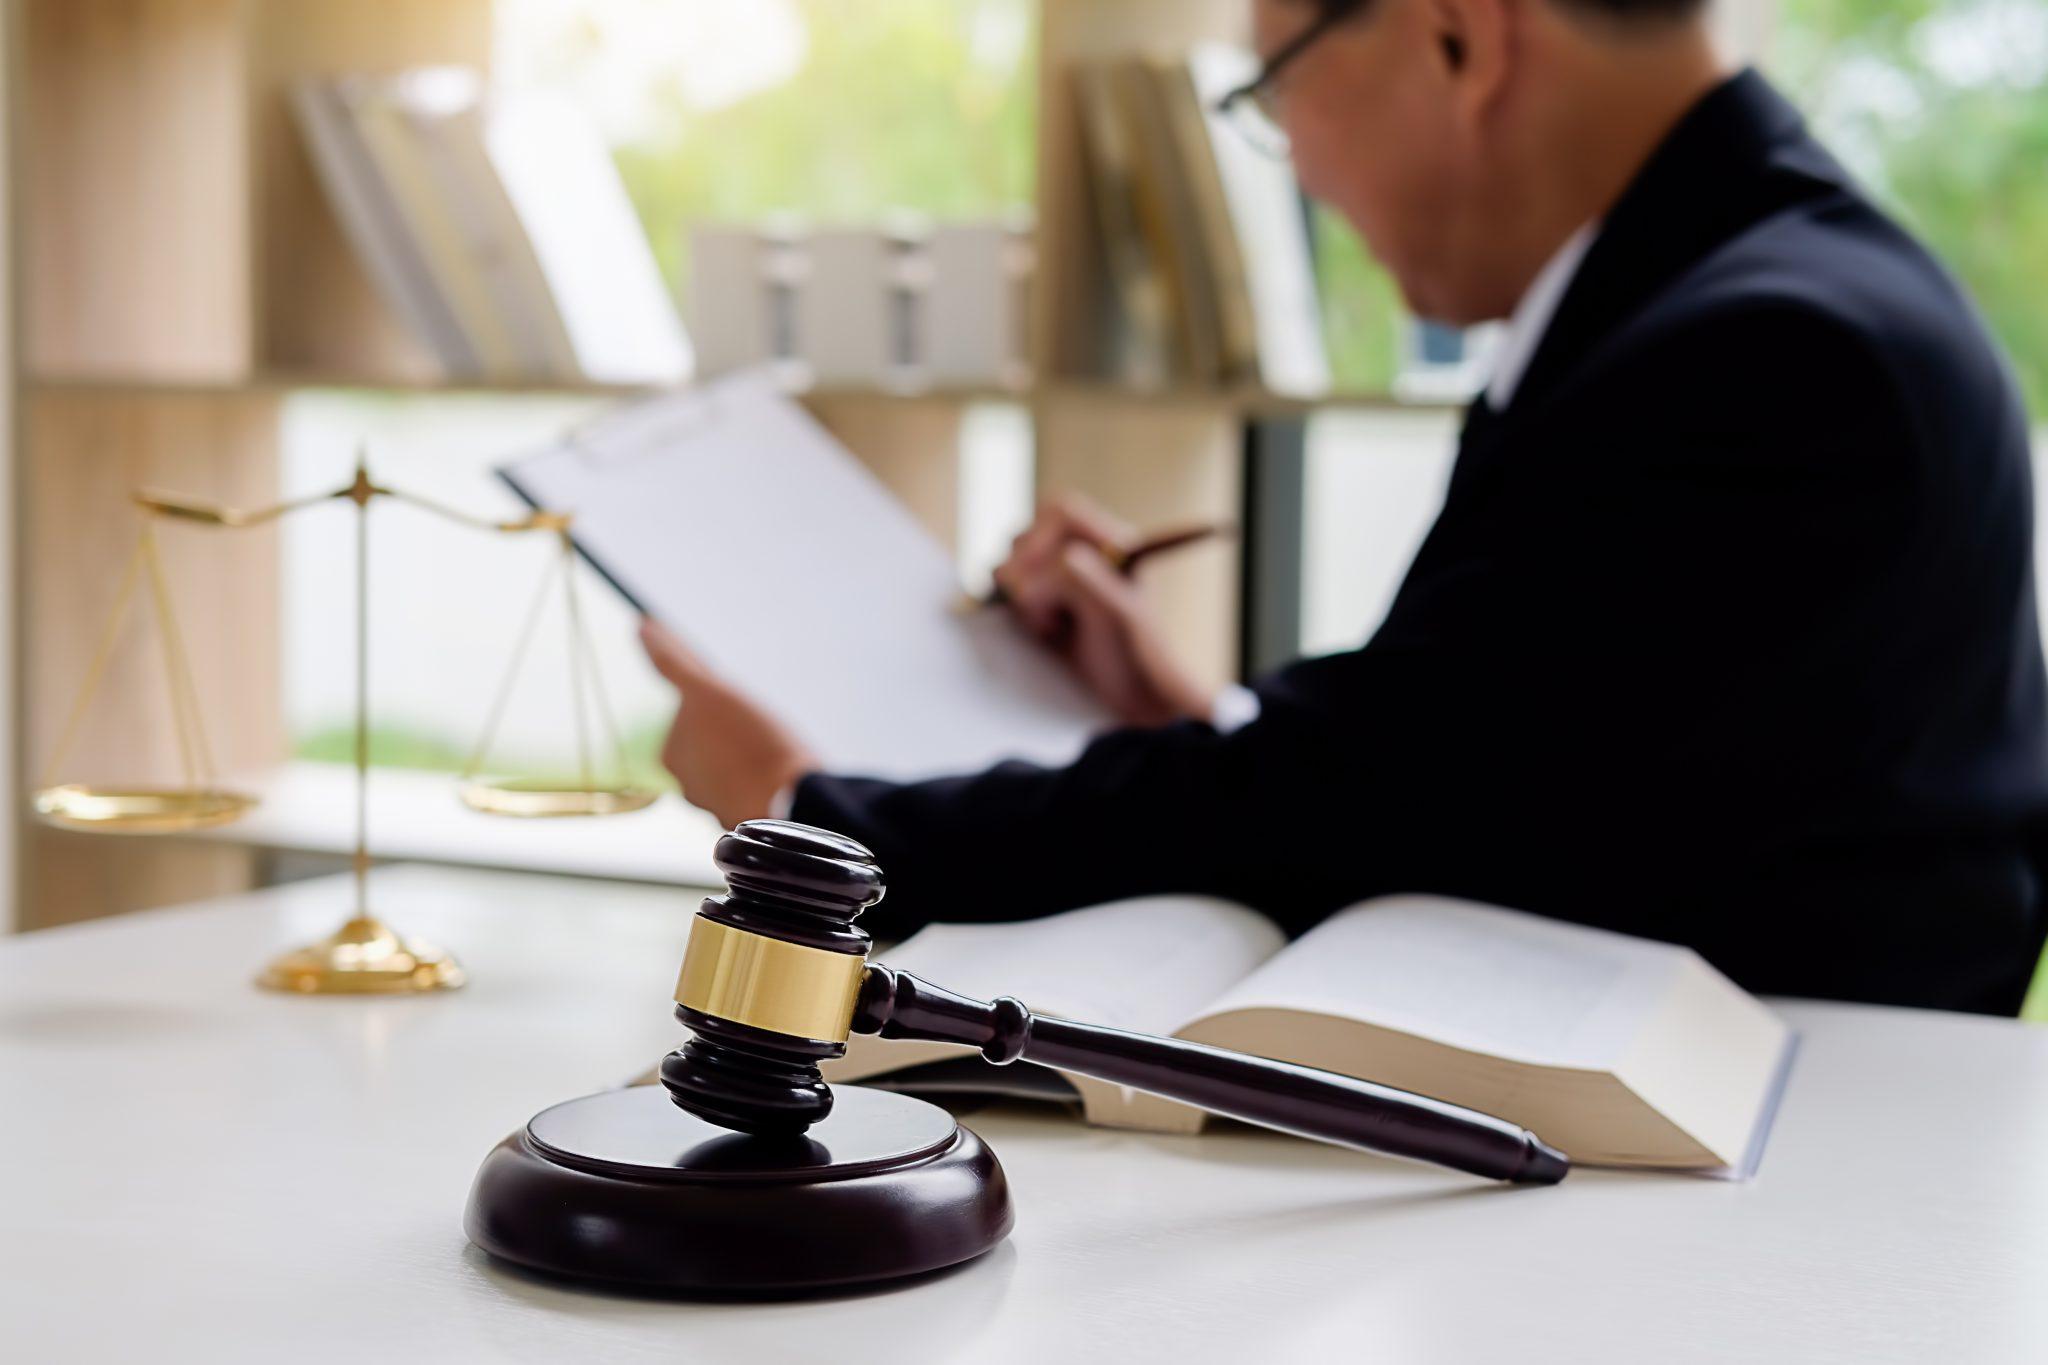 How Garofalo Law Firm